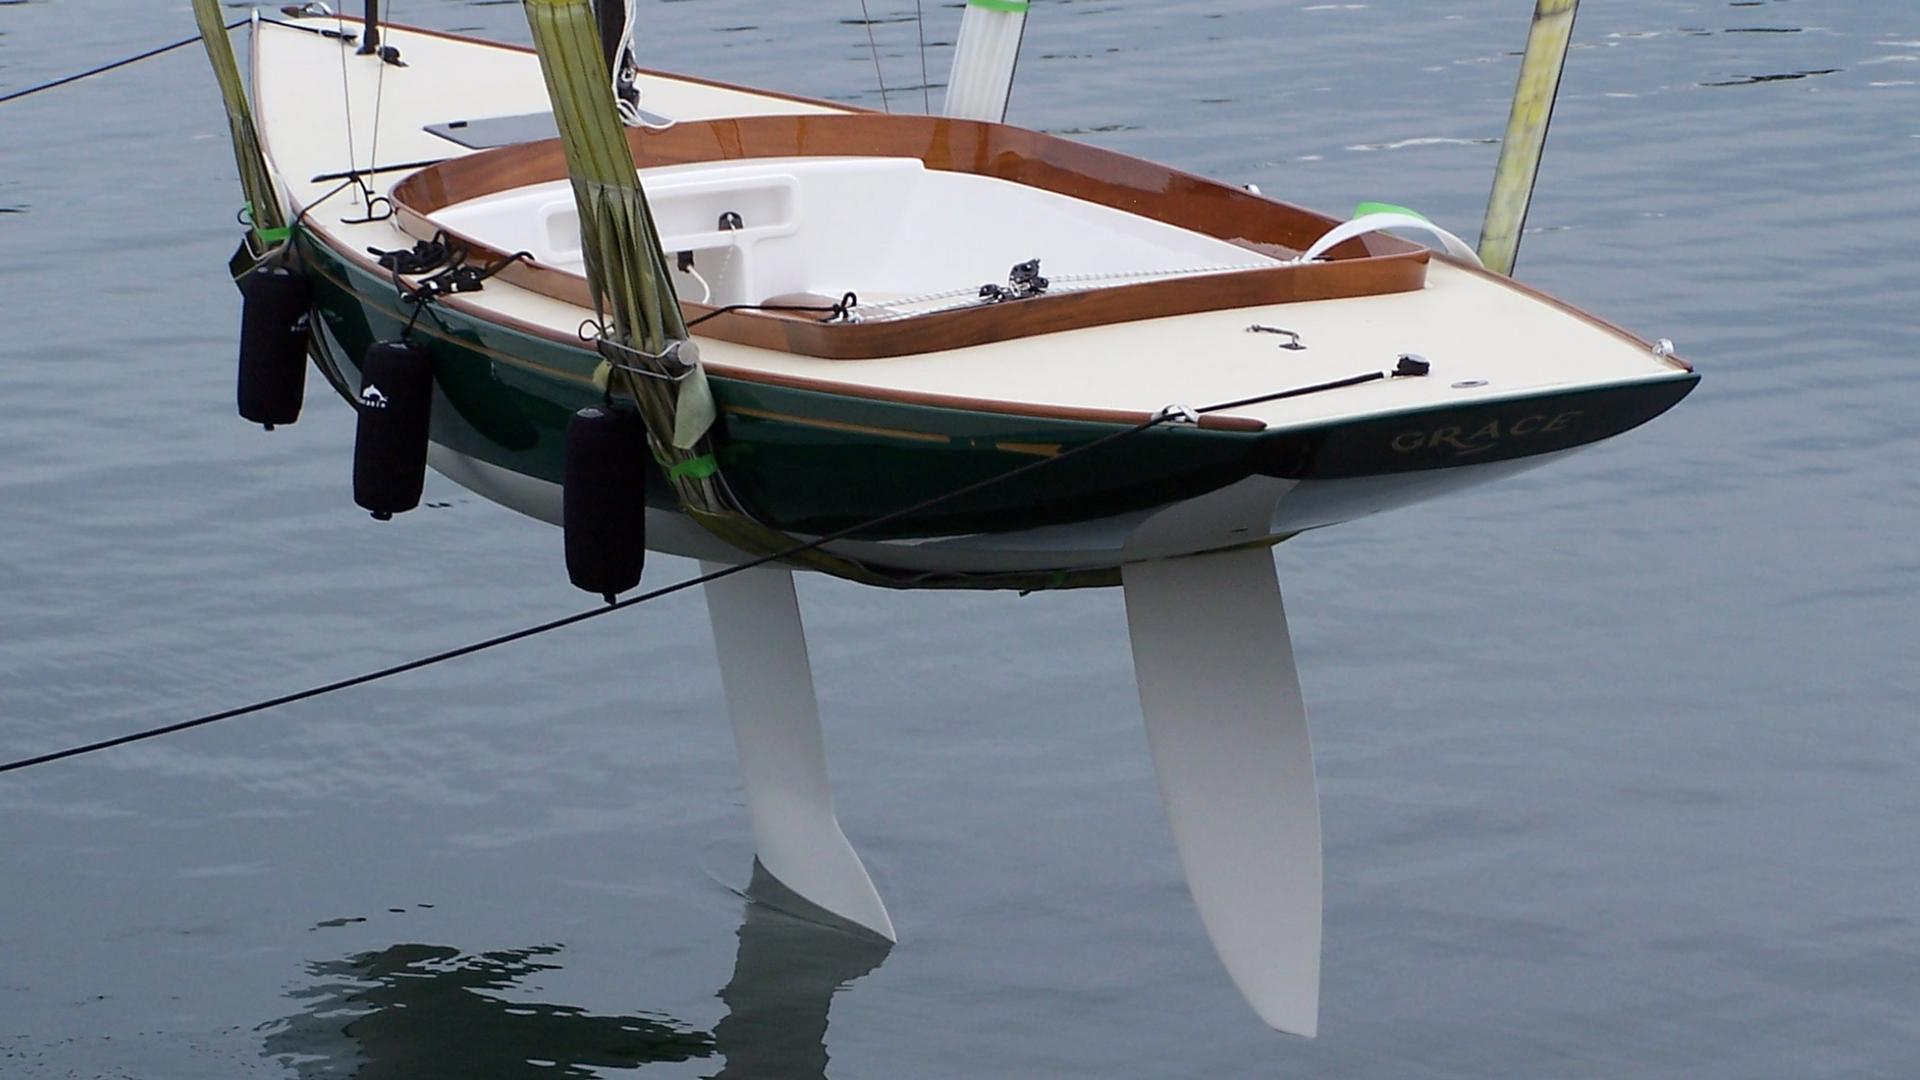 4' draft keel and carbon rudder.